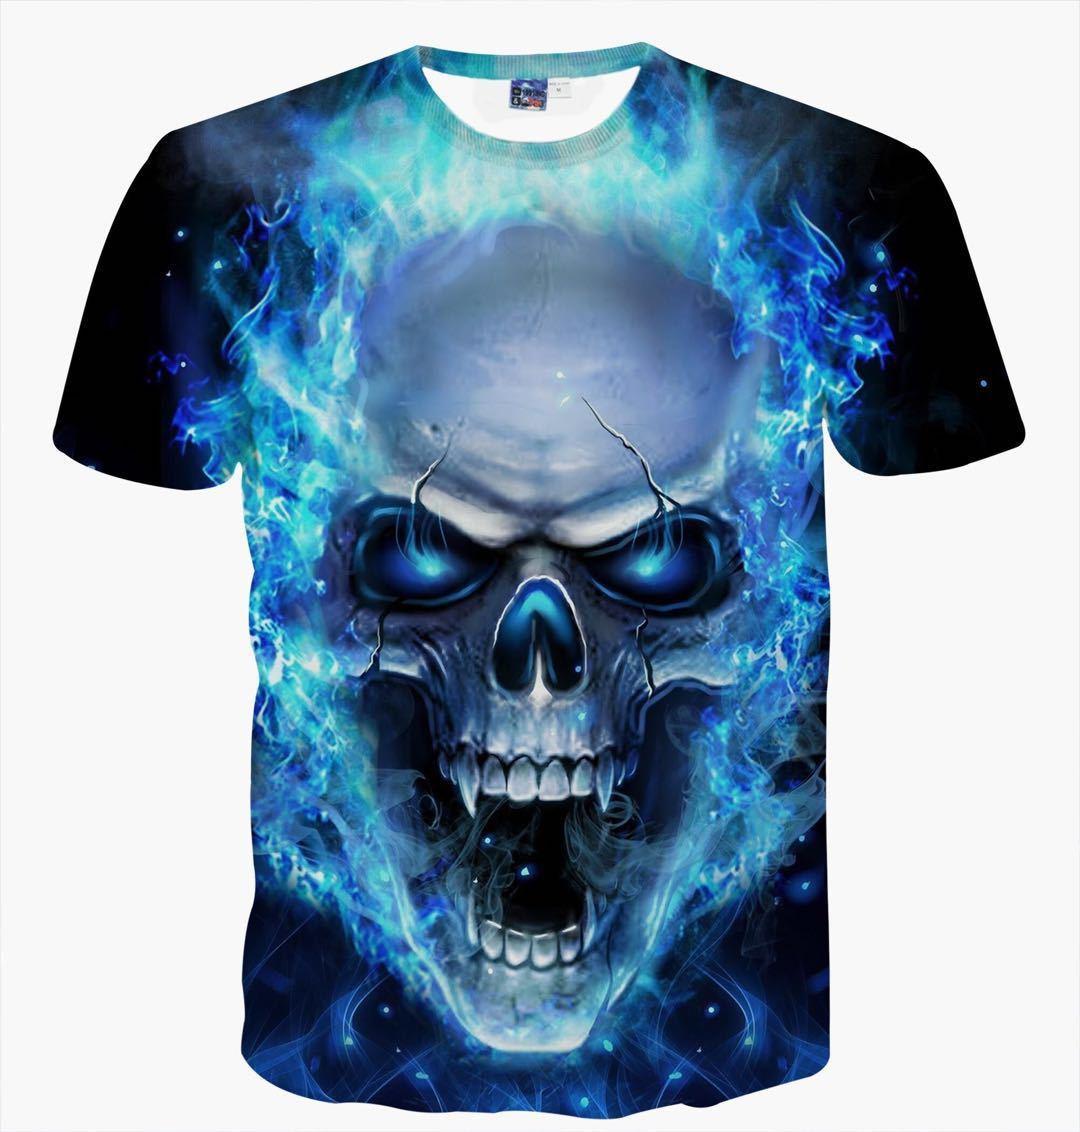 mens clothing t tee shirt homme shirts Women Men short sleeve Summer Hipster 3D skull man printed t-shirts Tees Tops tshirt